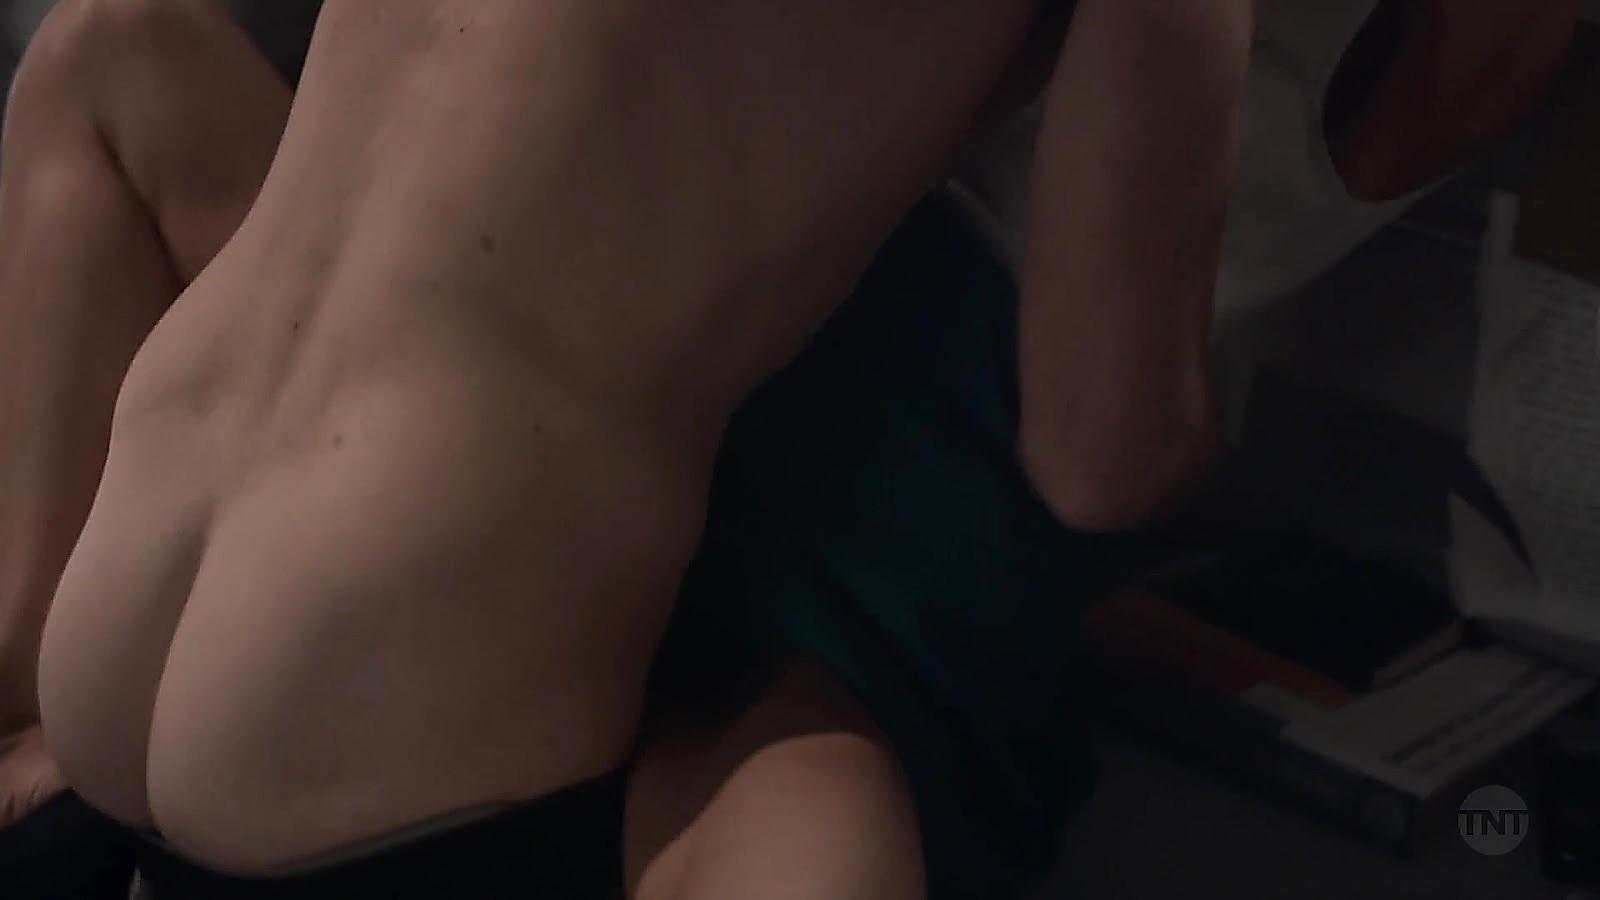 Iddo Goldberg sexy shirtless scene June 15, 2020, 12pm